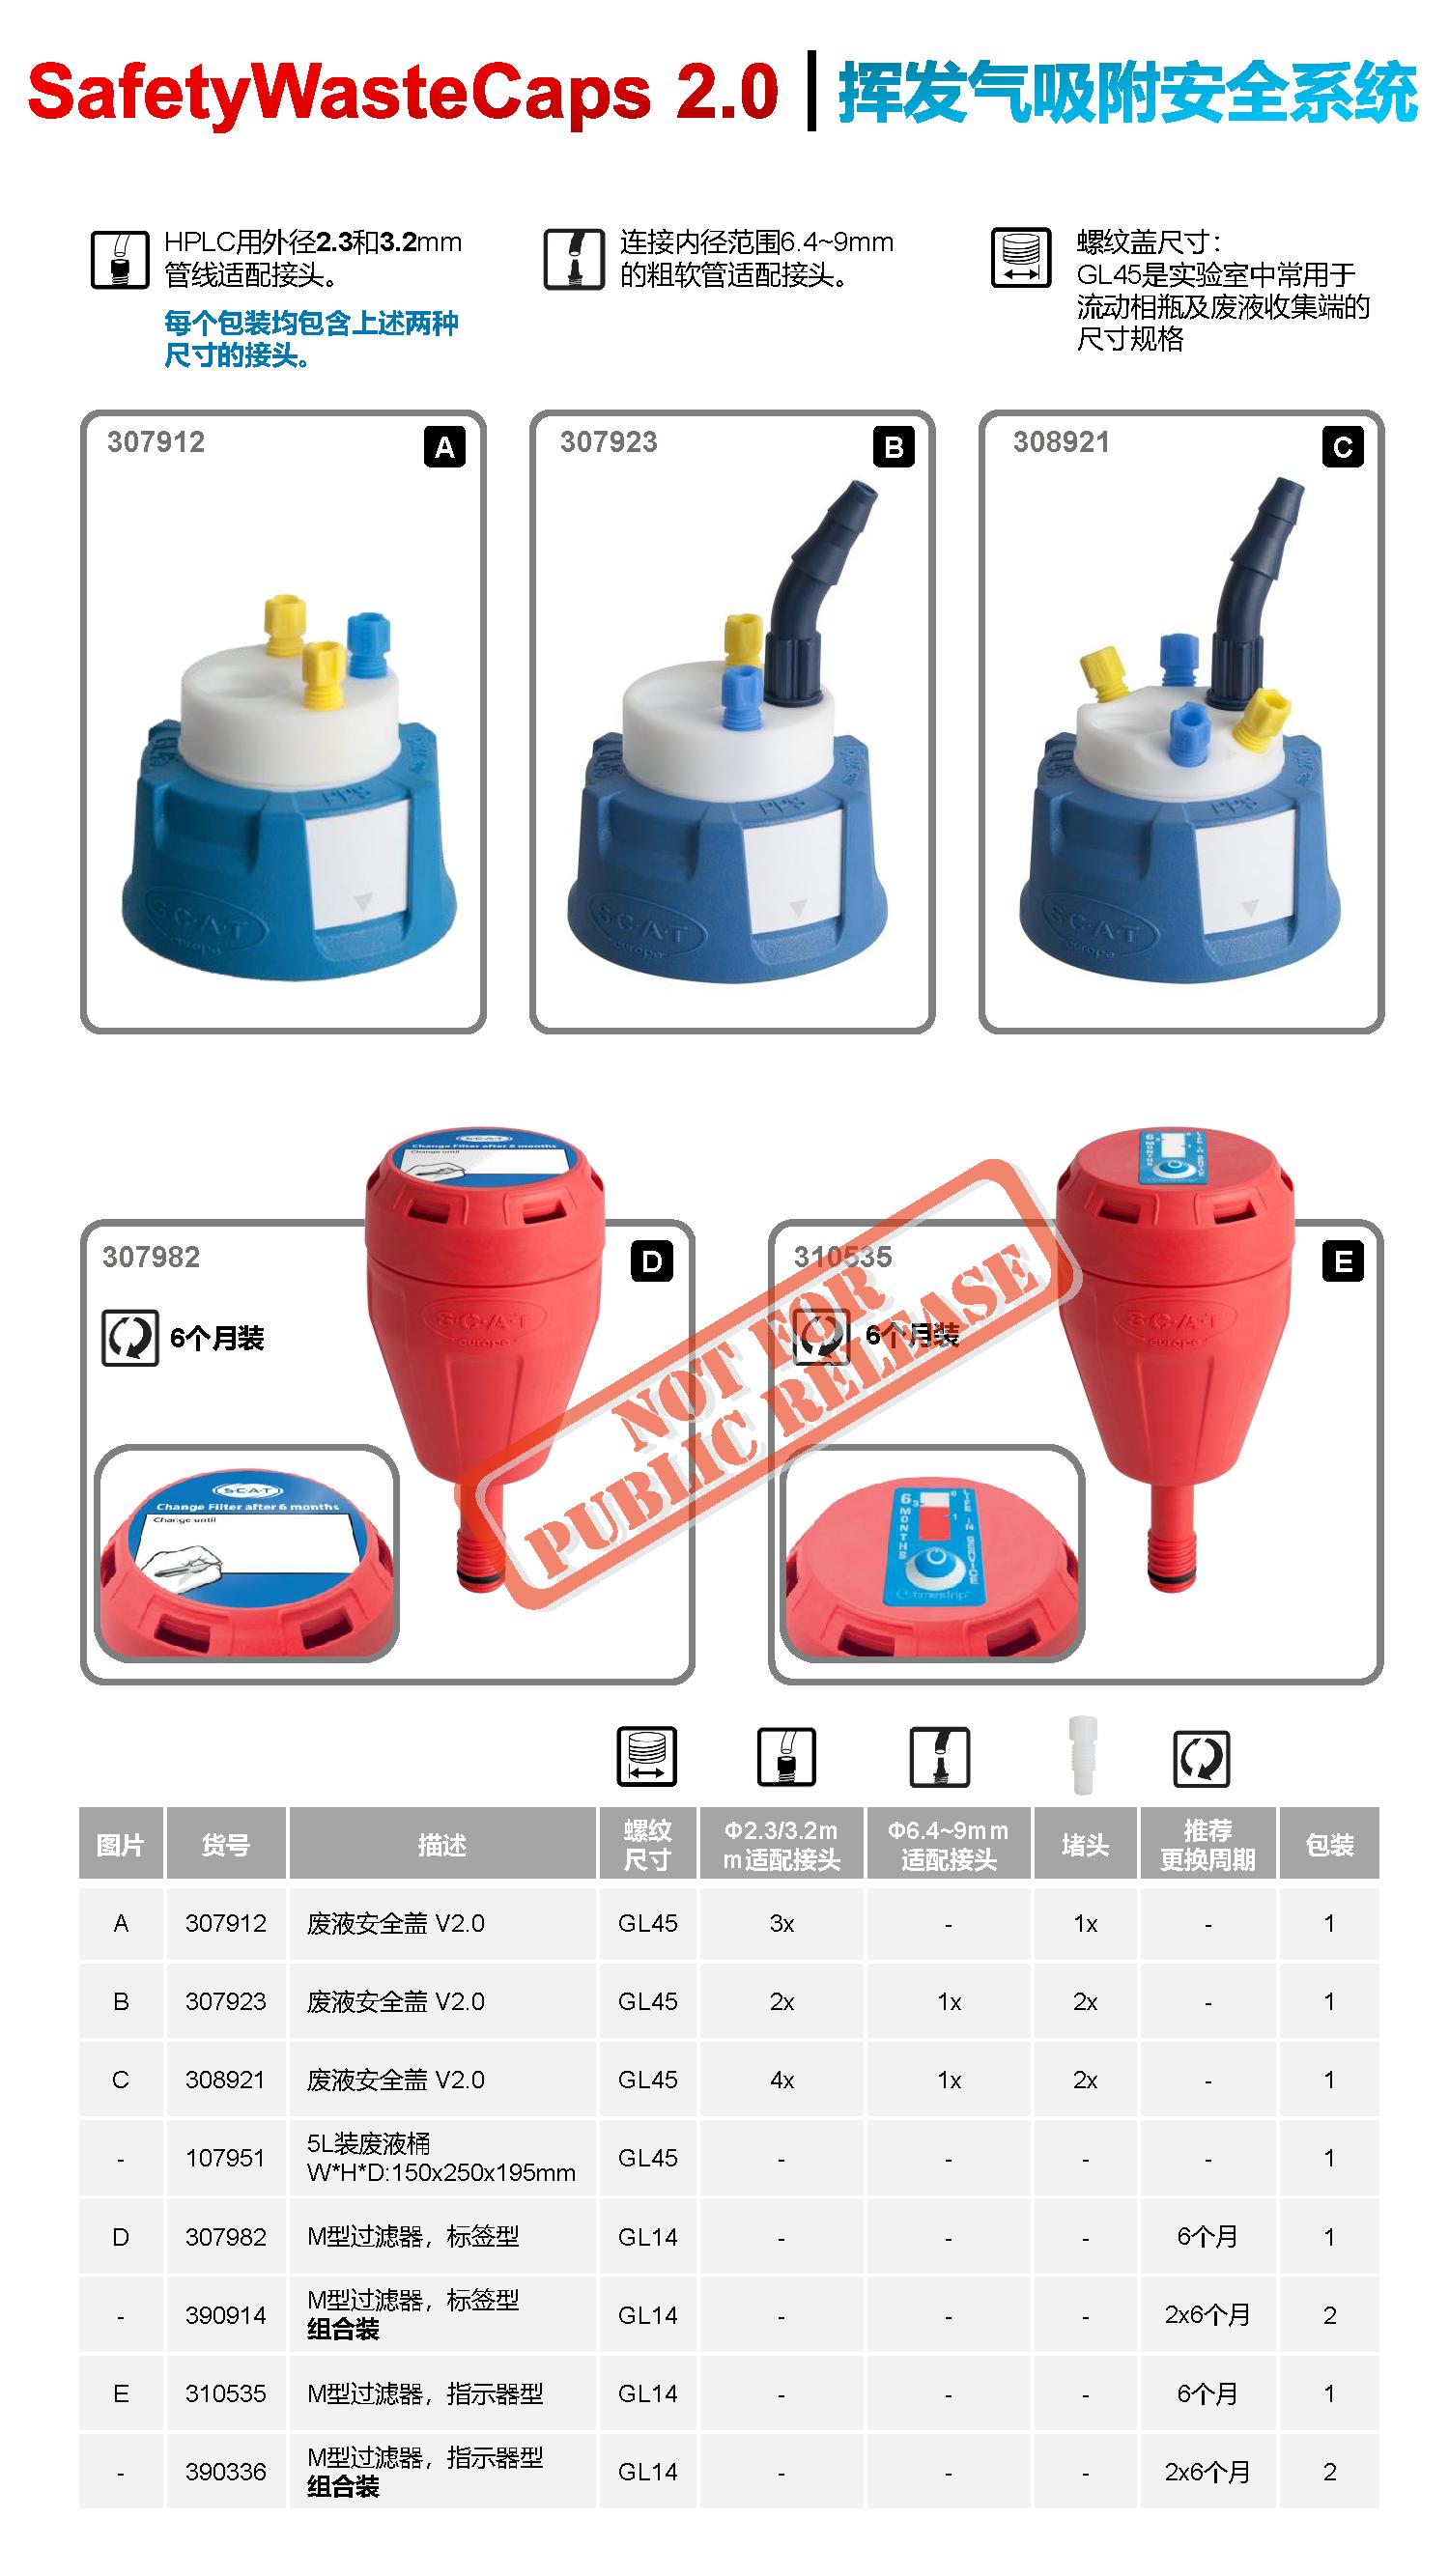 2019.10.22-SGLC第二代安全瓶盖目录(初稿)_页面_5.png